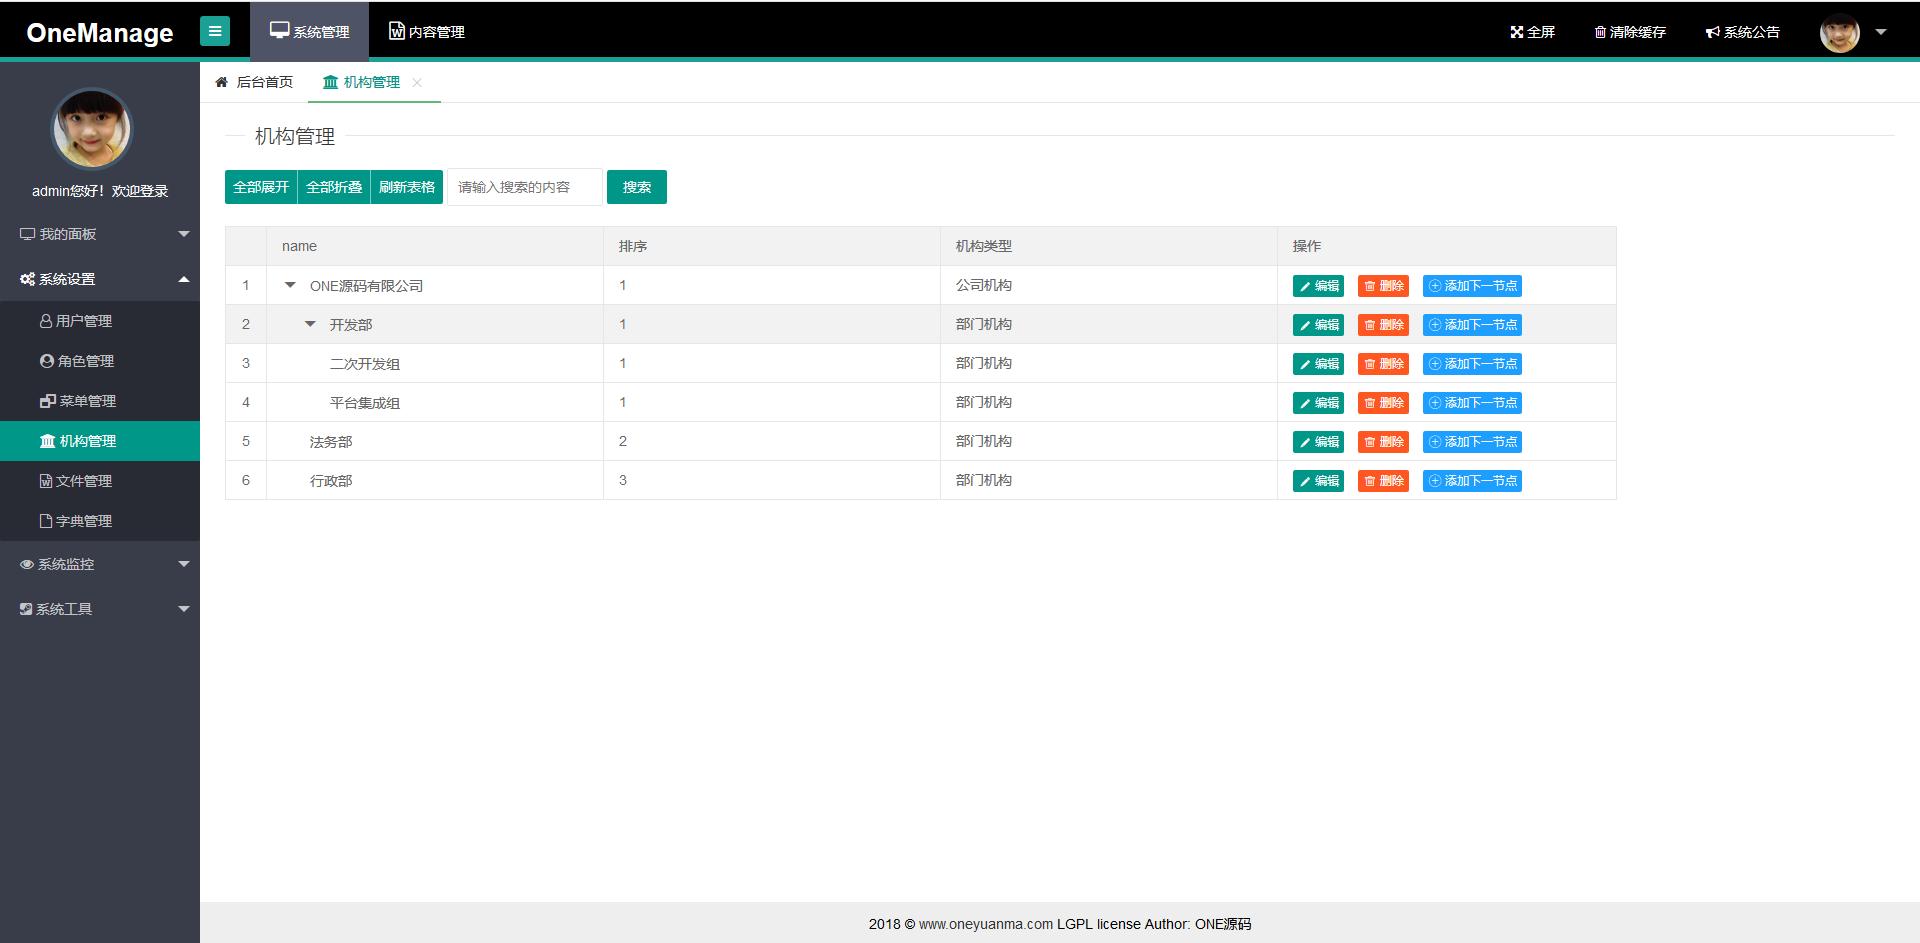 OneManage管理系统V2.1机构管理.png